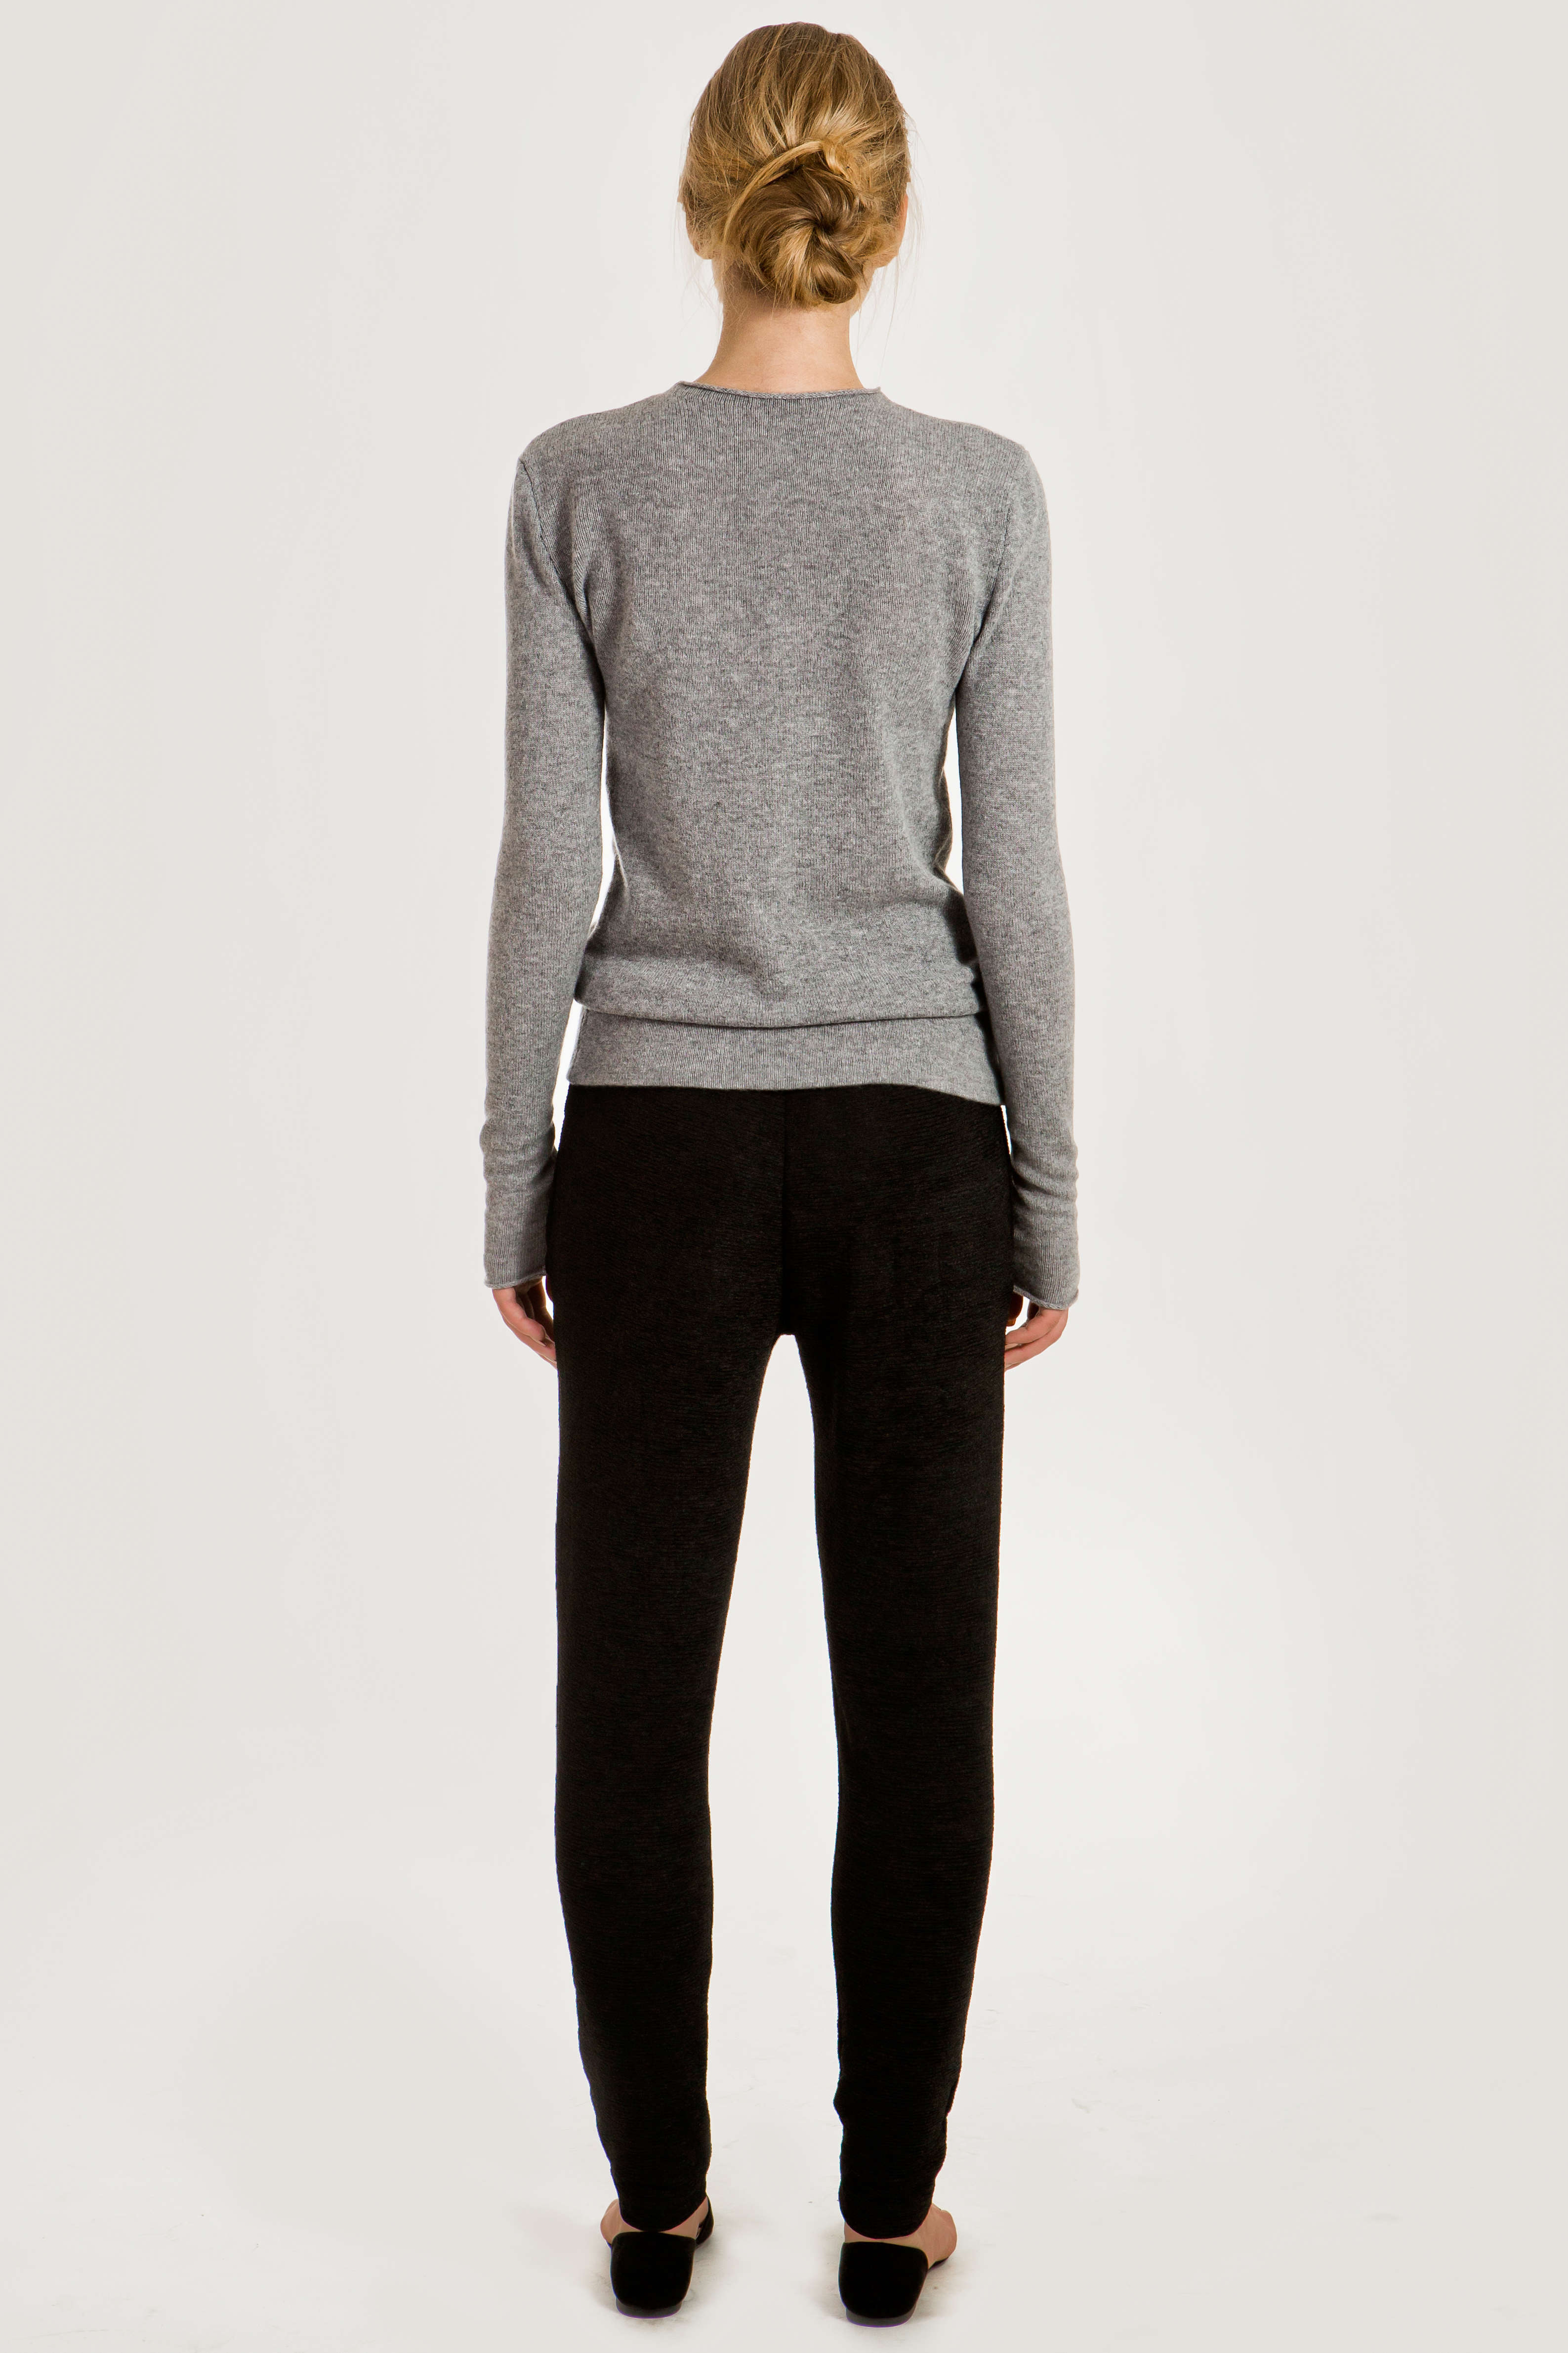 finest selection 4d91a 47655 Grey cashmere crew neck sweater KAREN